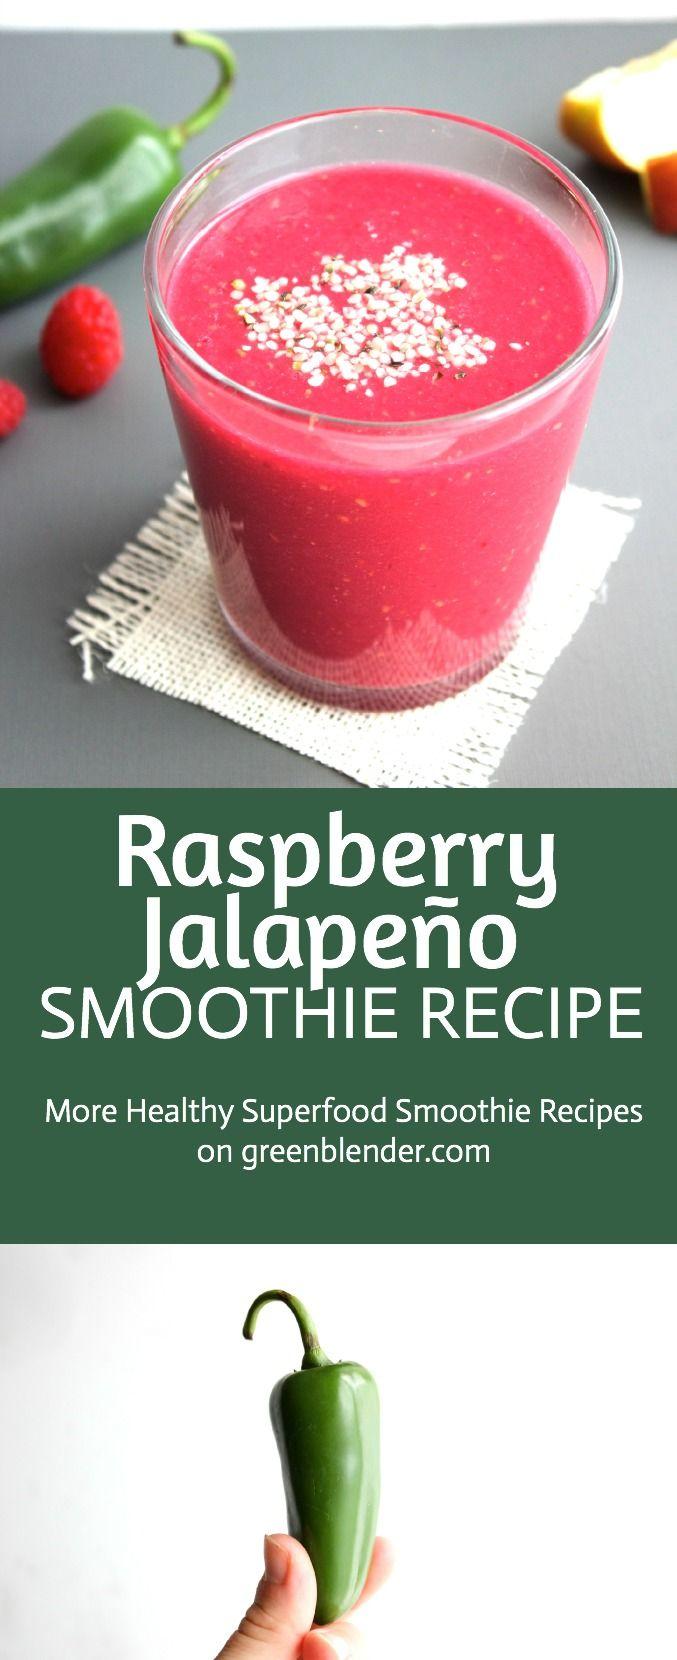 Raspberry Jalapeño Smoothie Recipe by Green Blender